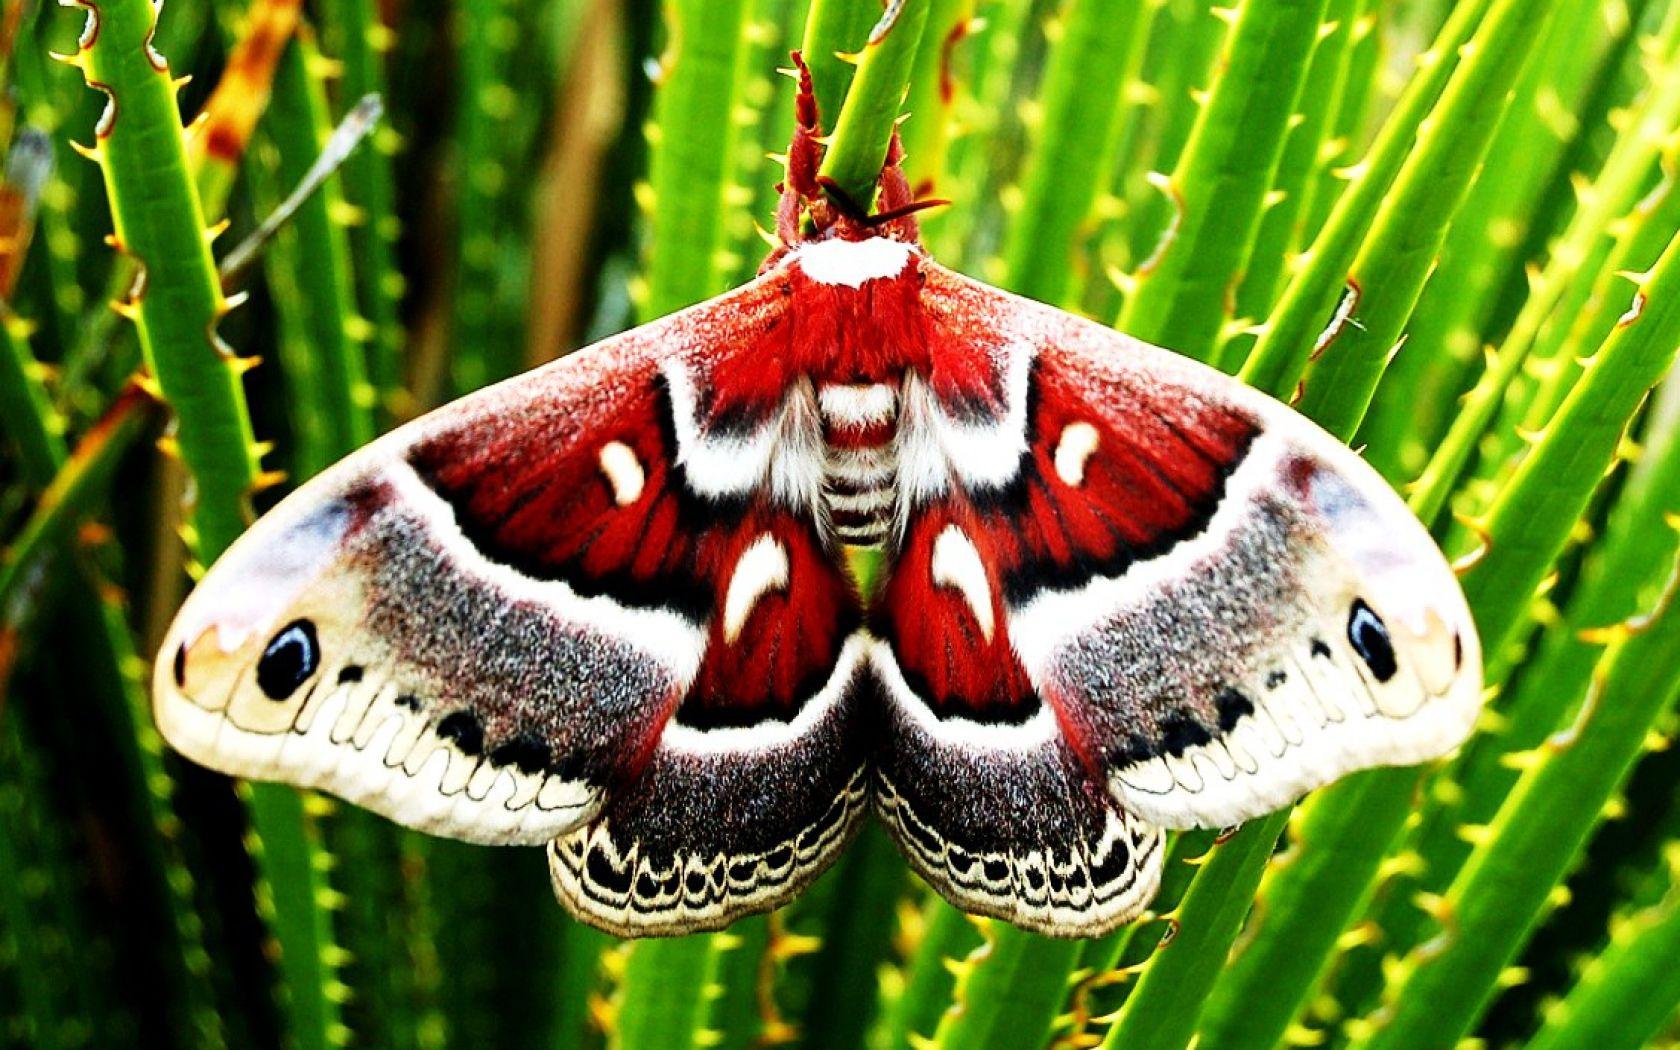 Columbia Moth In Texas. Silkworm moth, Cecropia moth